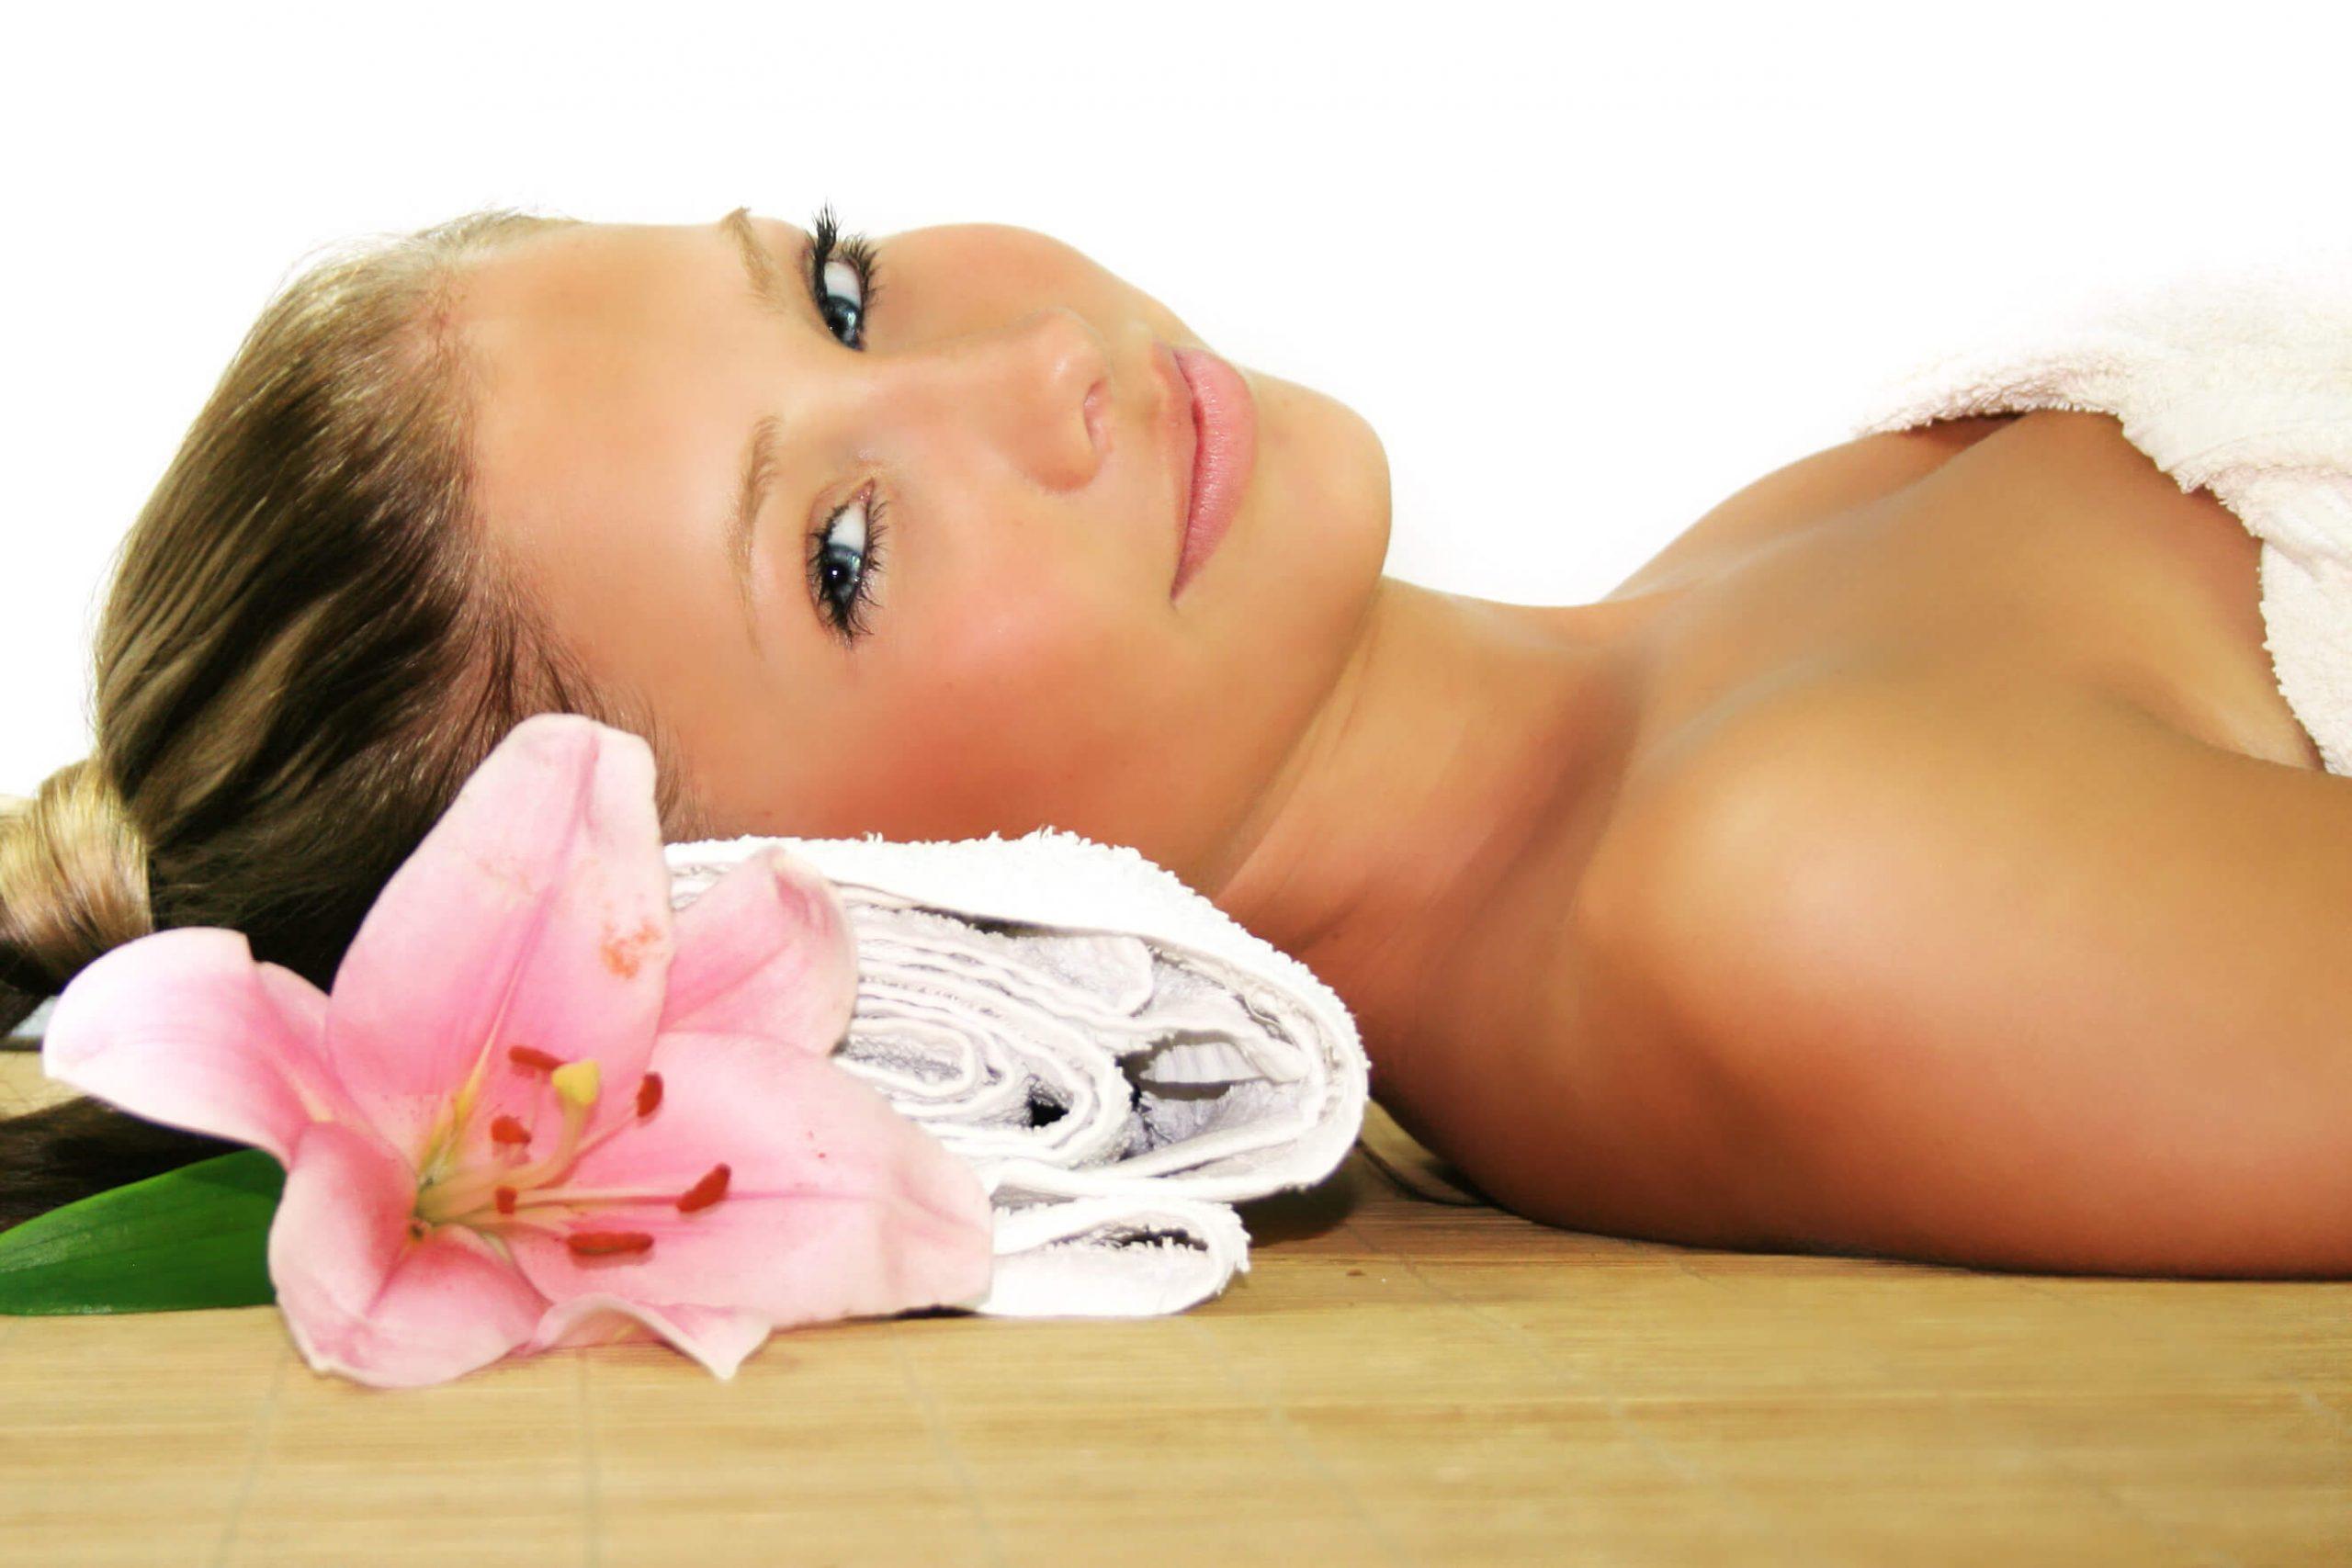 Junge Frau bei Kosmetikbehandlung mit rosafarbener Lotusblüte